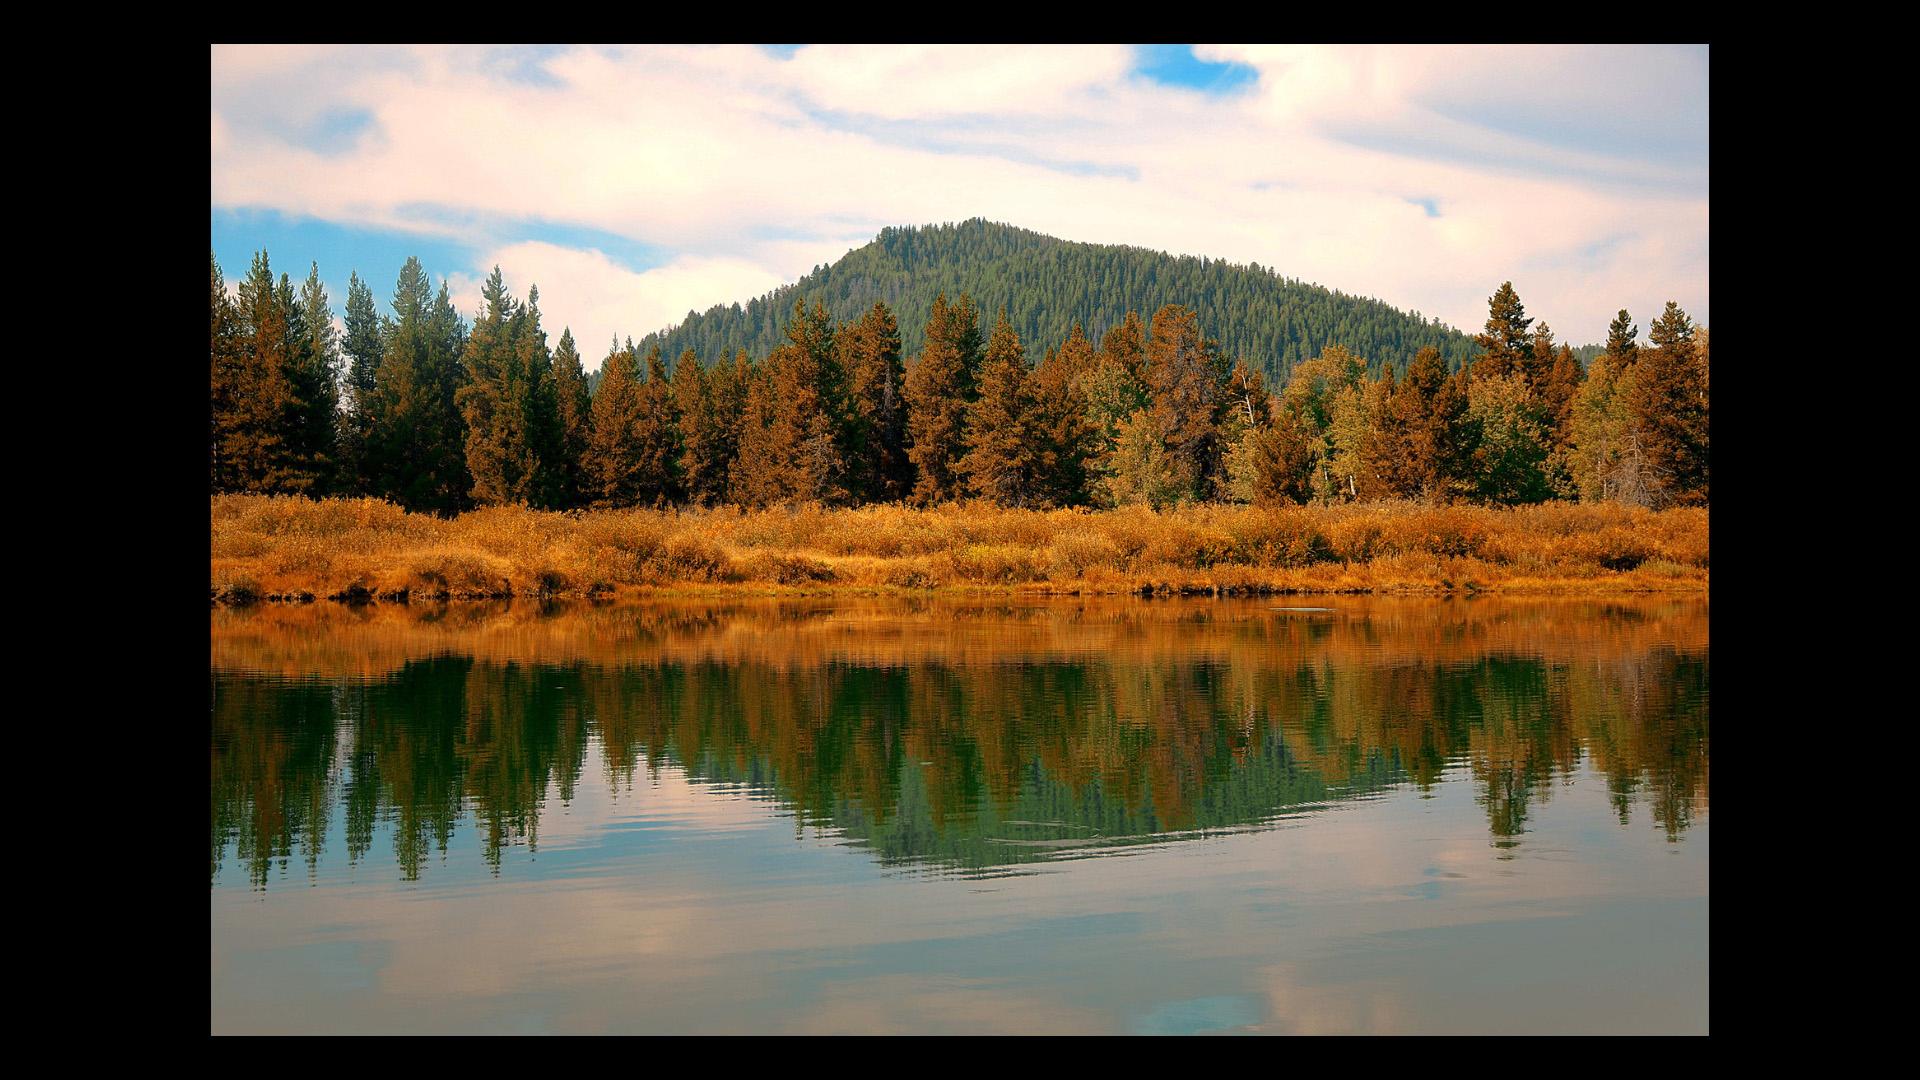 2015, Yellowstone, Nikon D7200